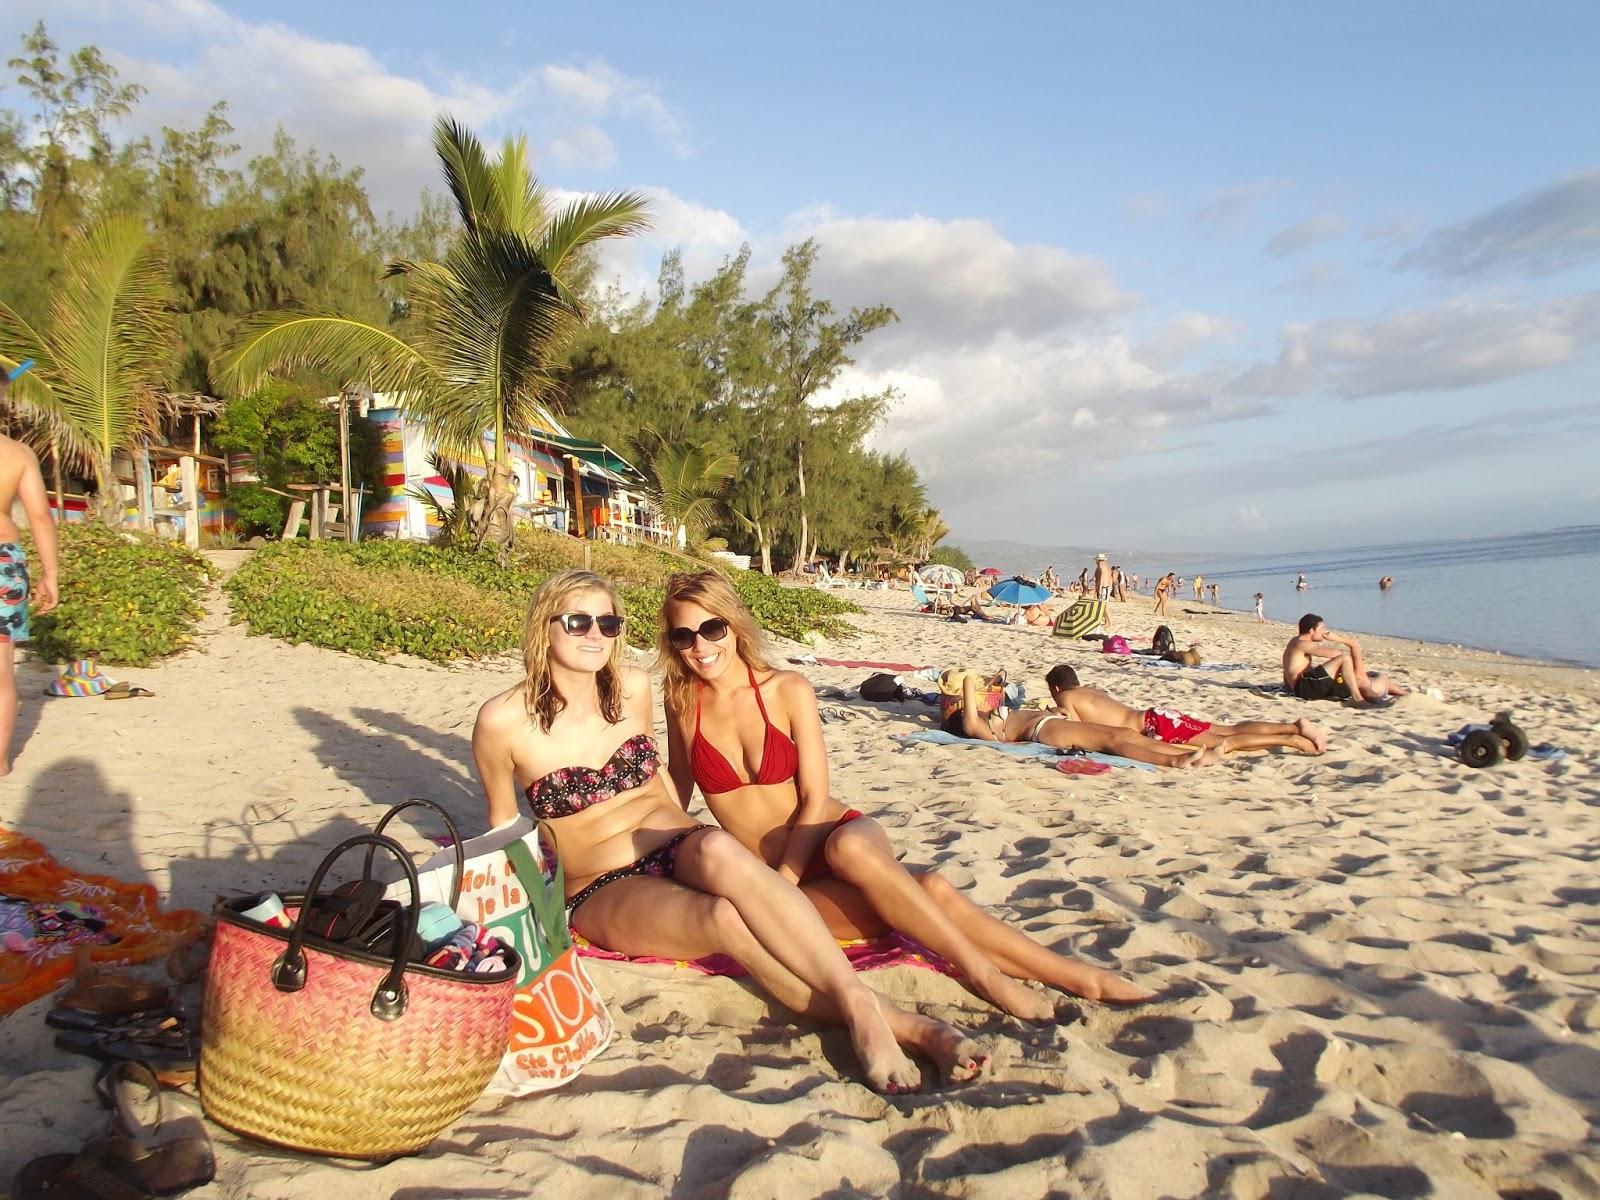 reunion island women